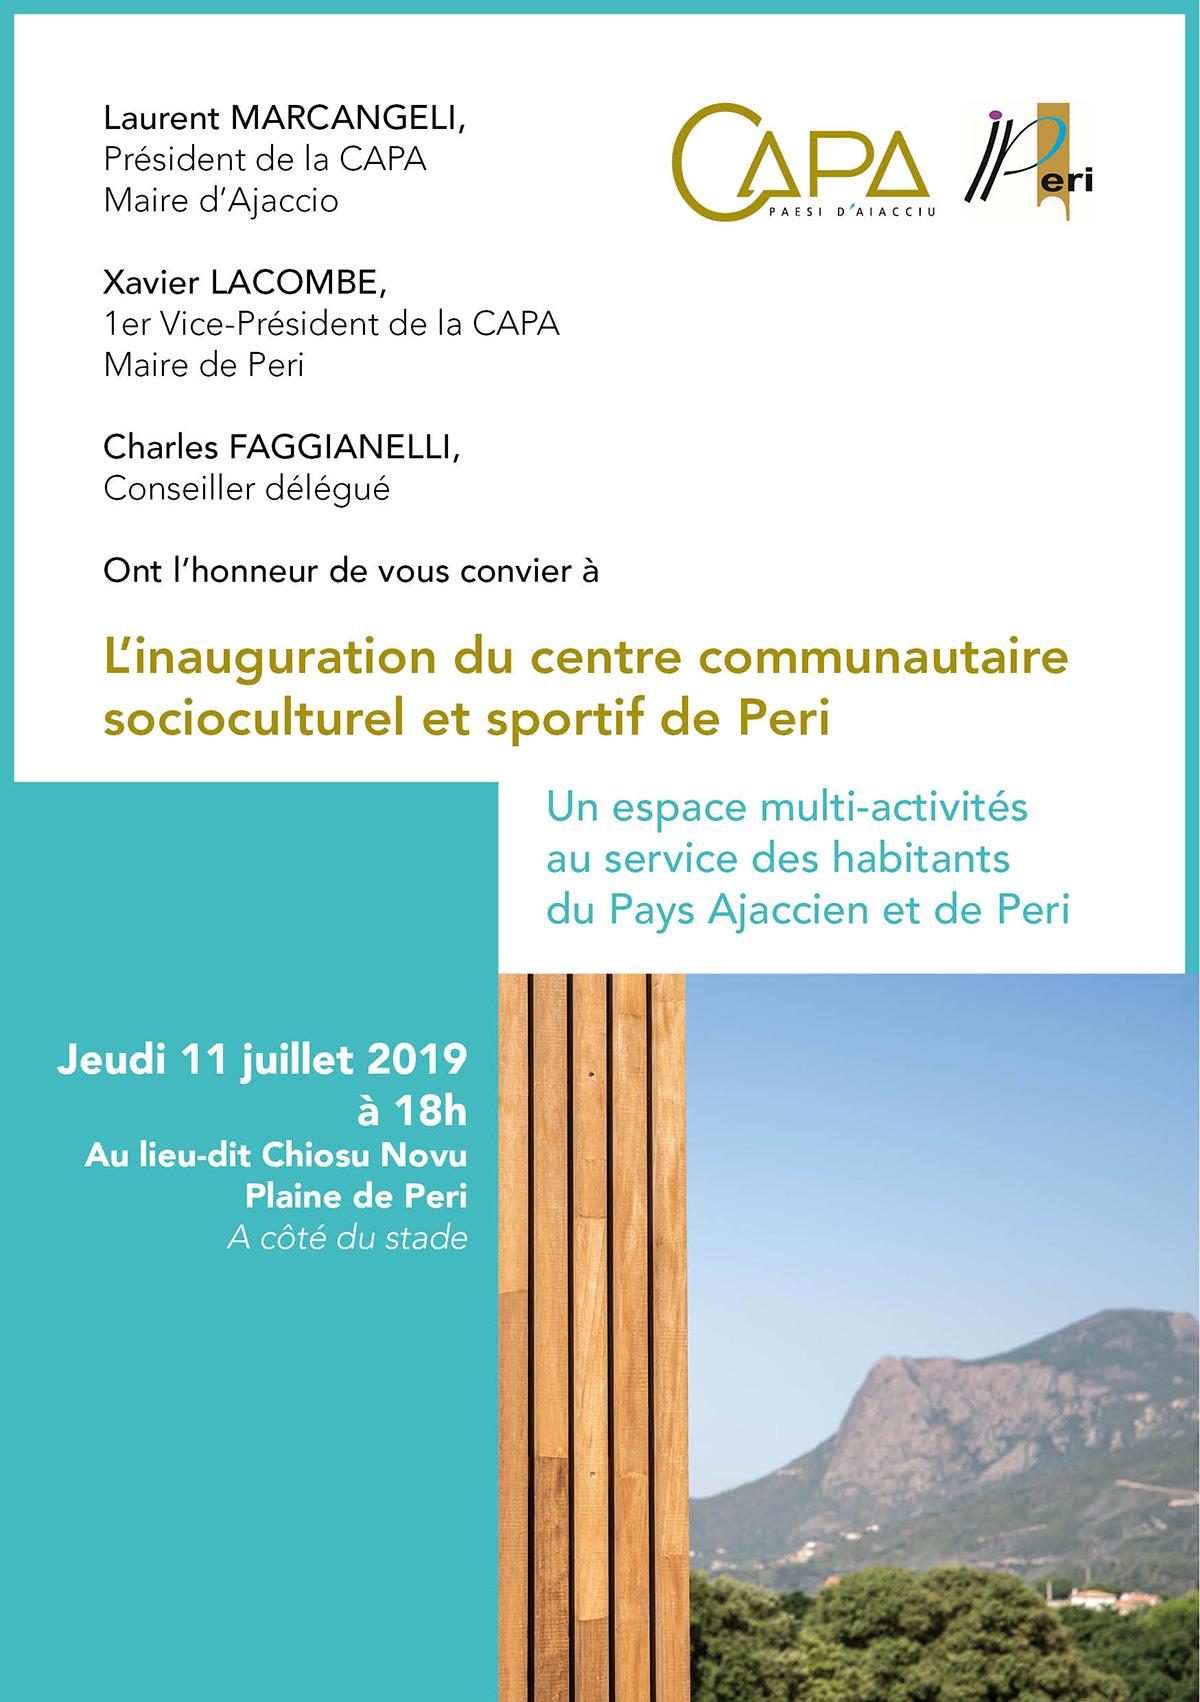 Invitation à l'inauguration du centre communautaire socioculturel et sportif de Peri